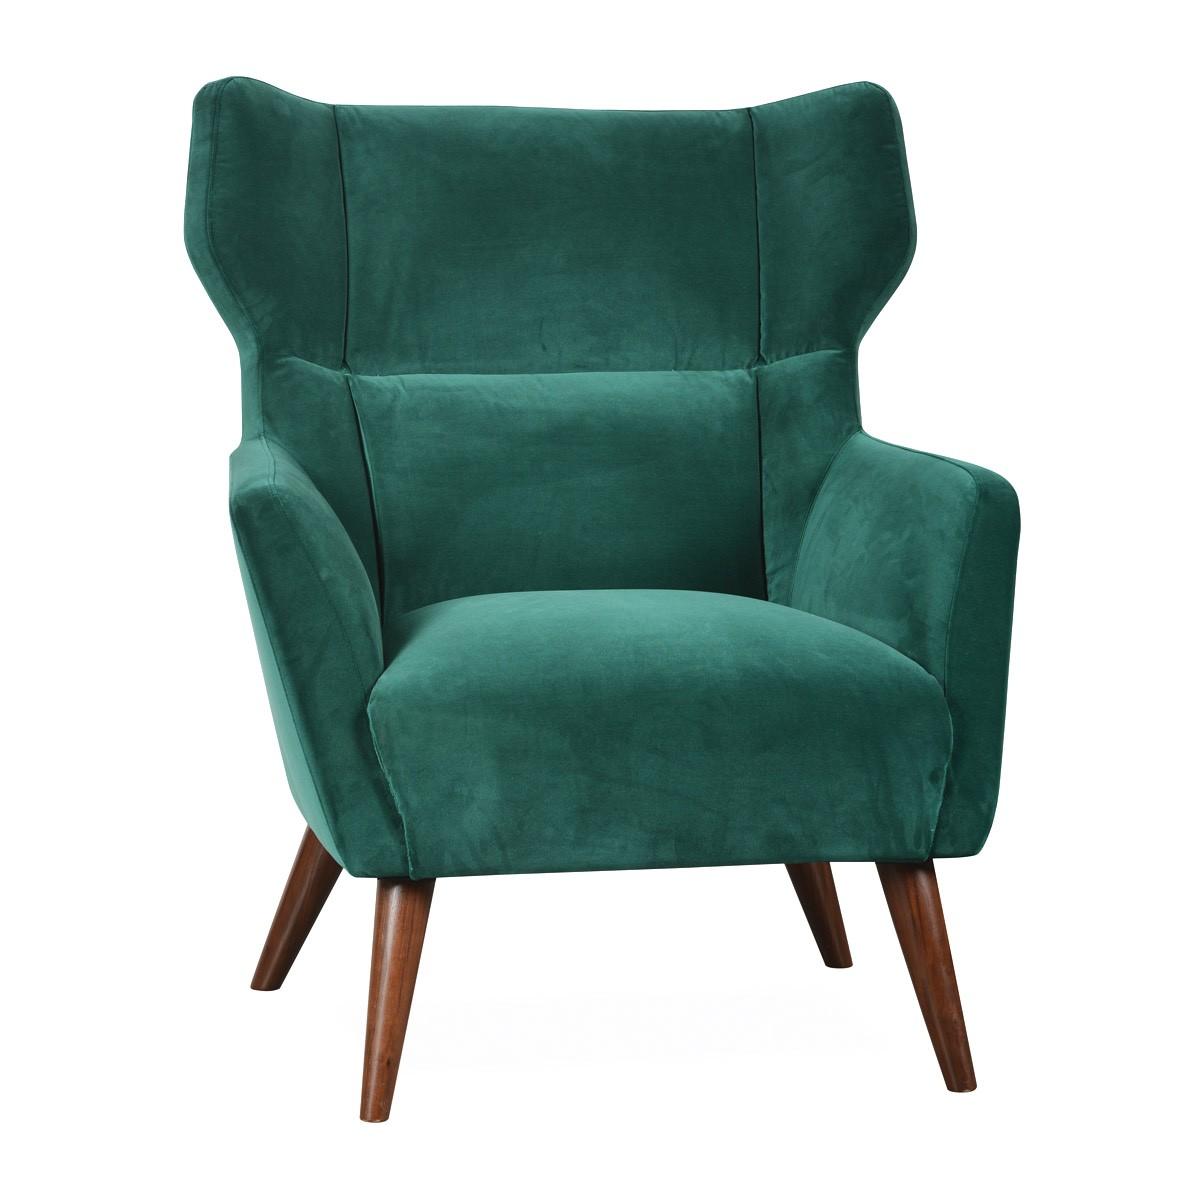 Alexa Commercial Grade Velvet Fabric Wingback Armchair, Jade